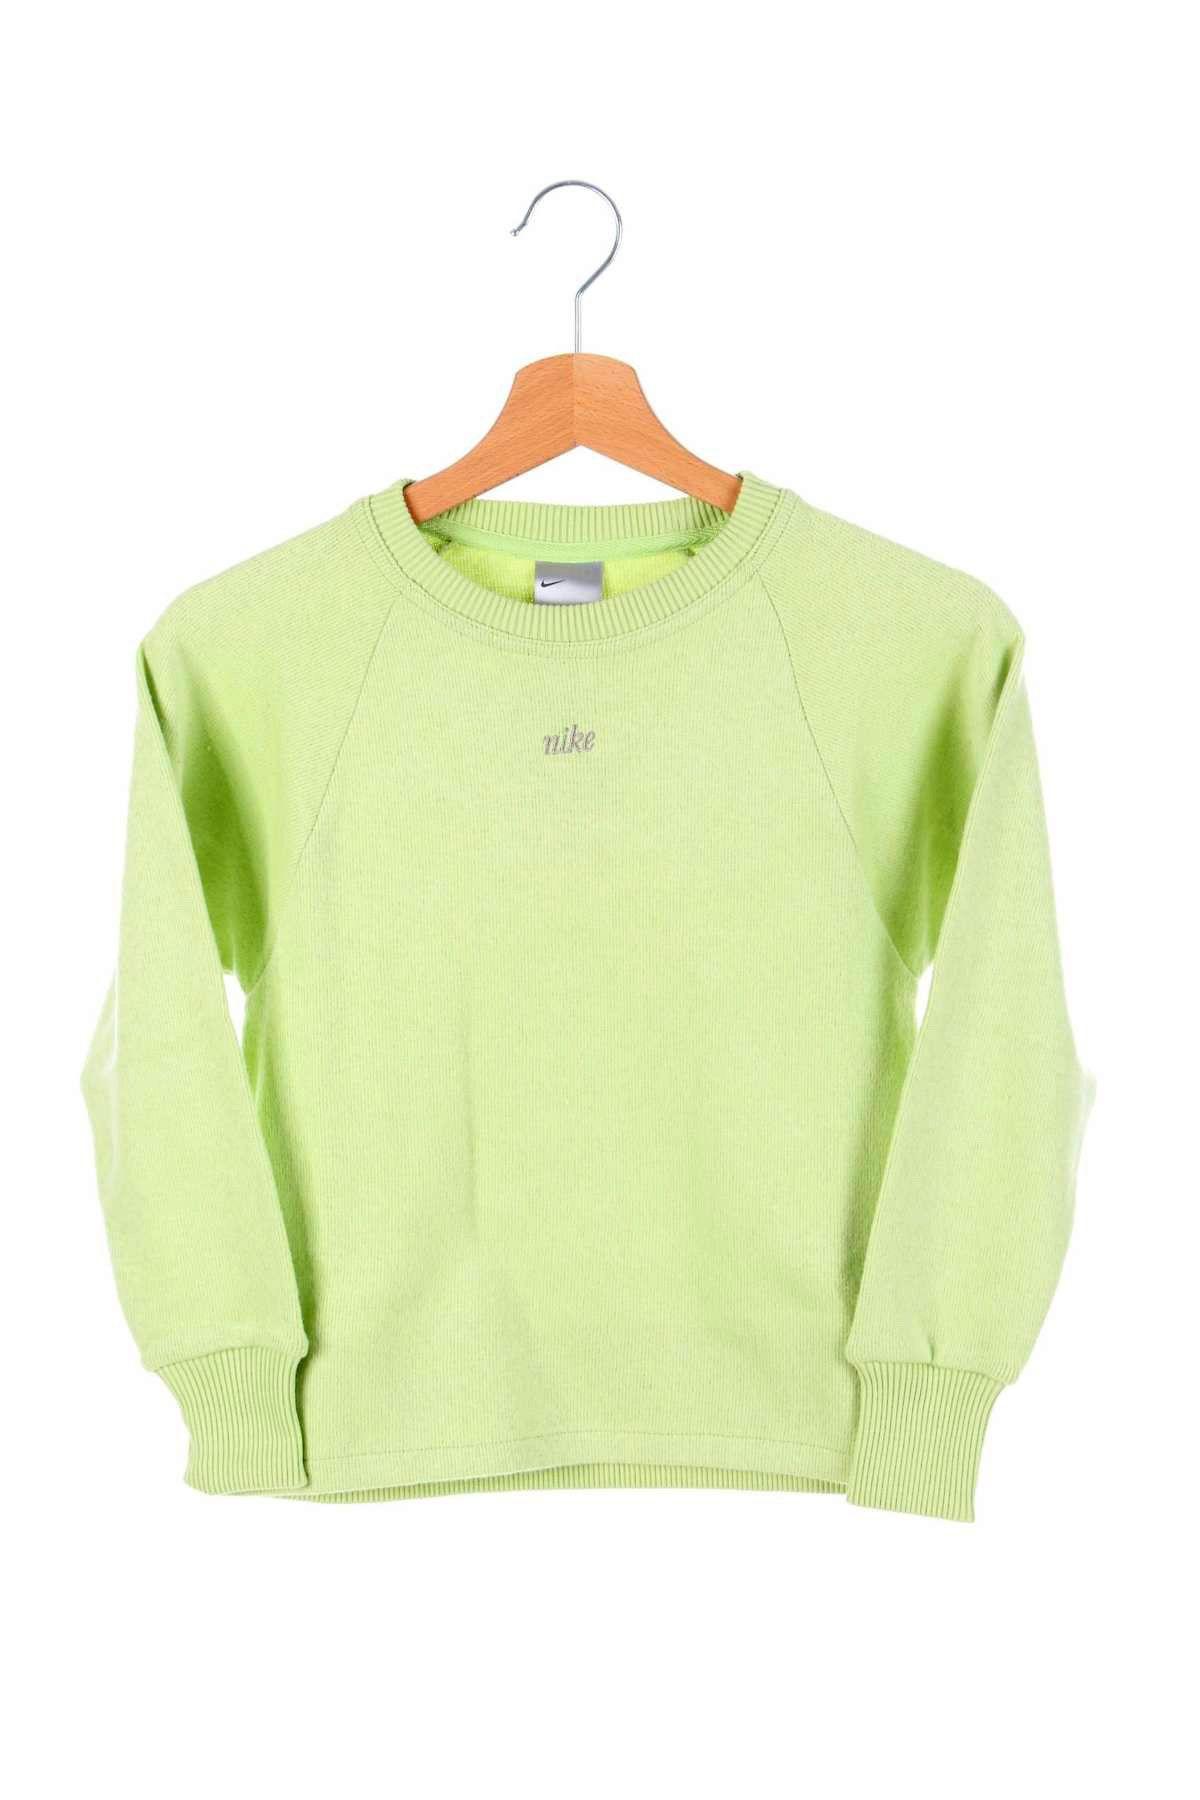 Vintage 90s Nike Spell Out Logo Swoosh Sweatshirt Blue Size Etsy Sweatshirts Fashion Inspo Outfits Nike [ 1800 x 1200 Pixel ]